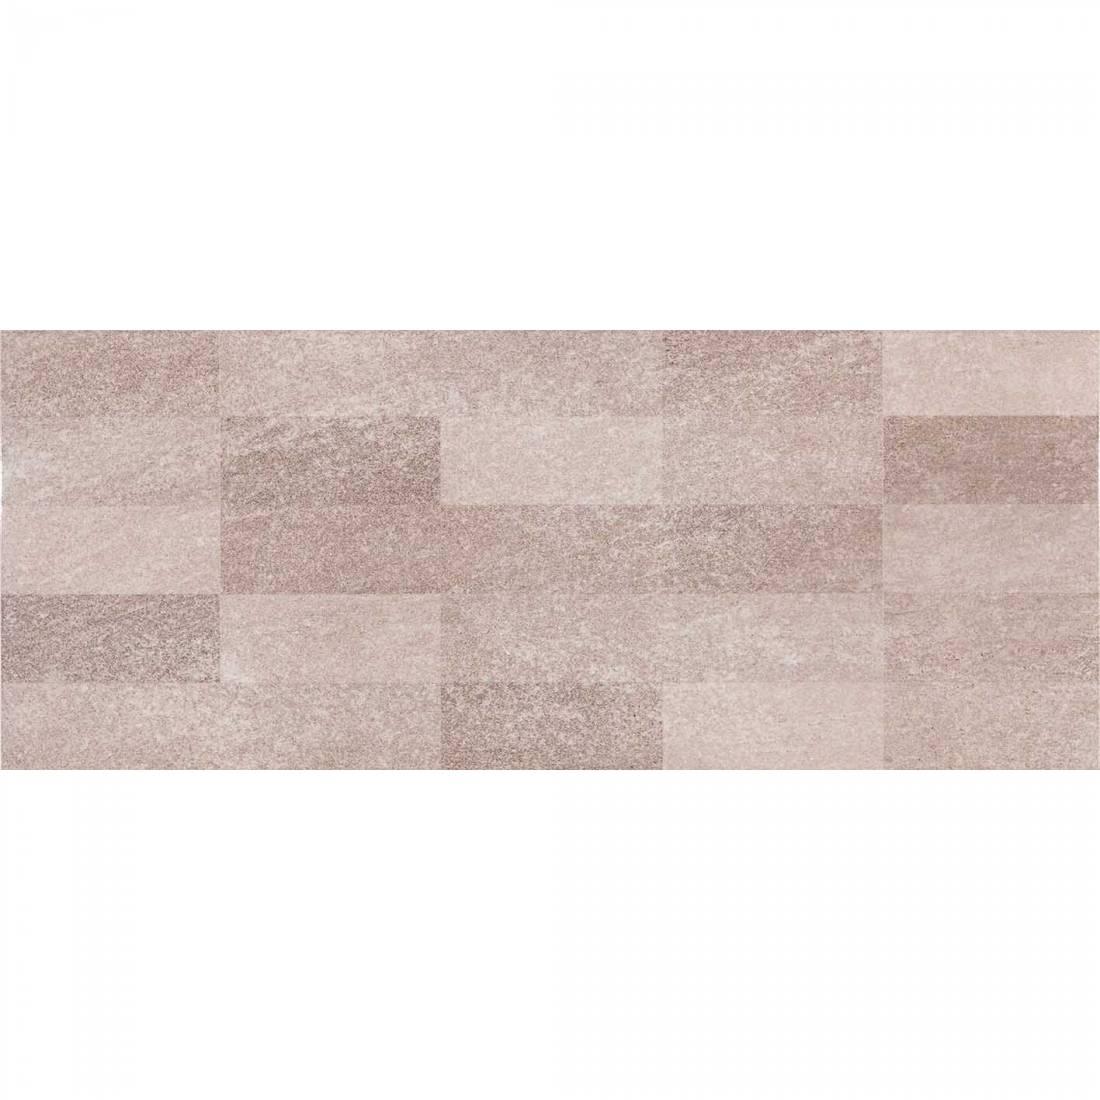 Mohave New Brick 20x50 Grey Gloss 1